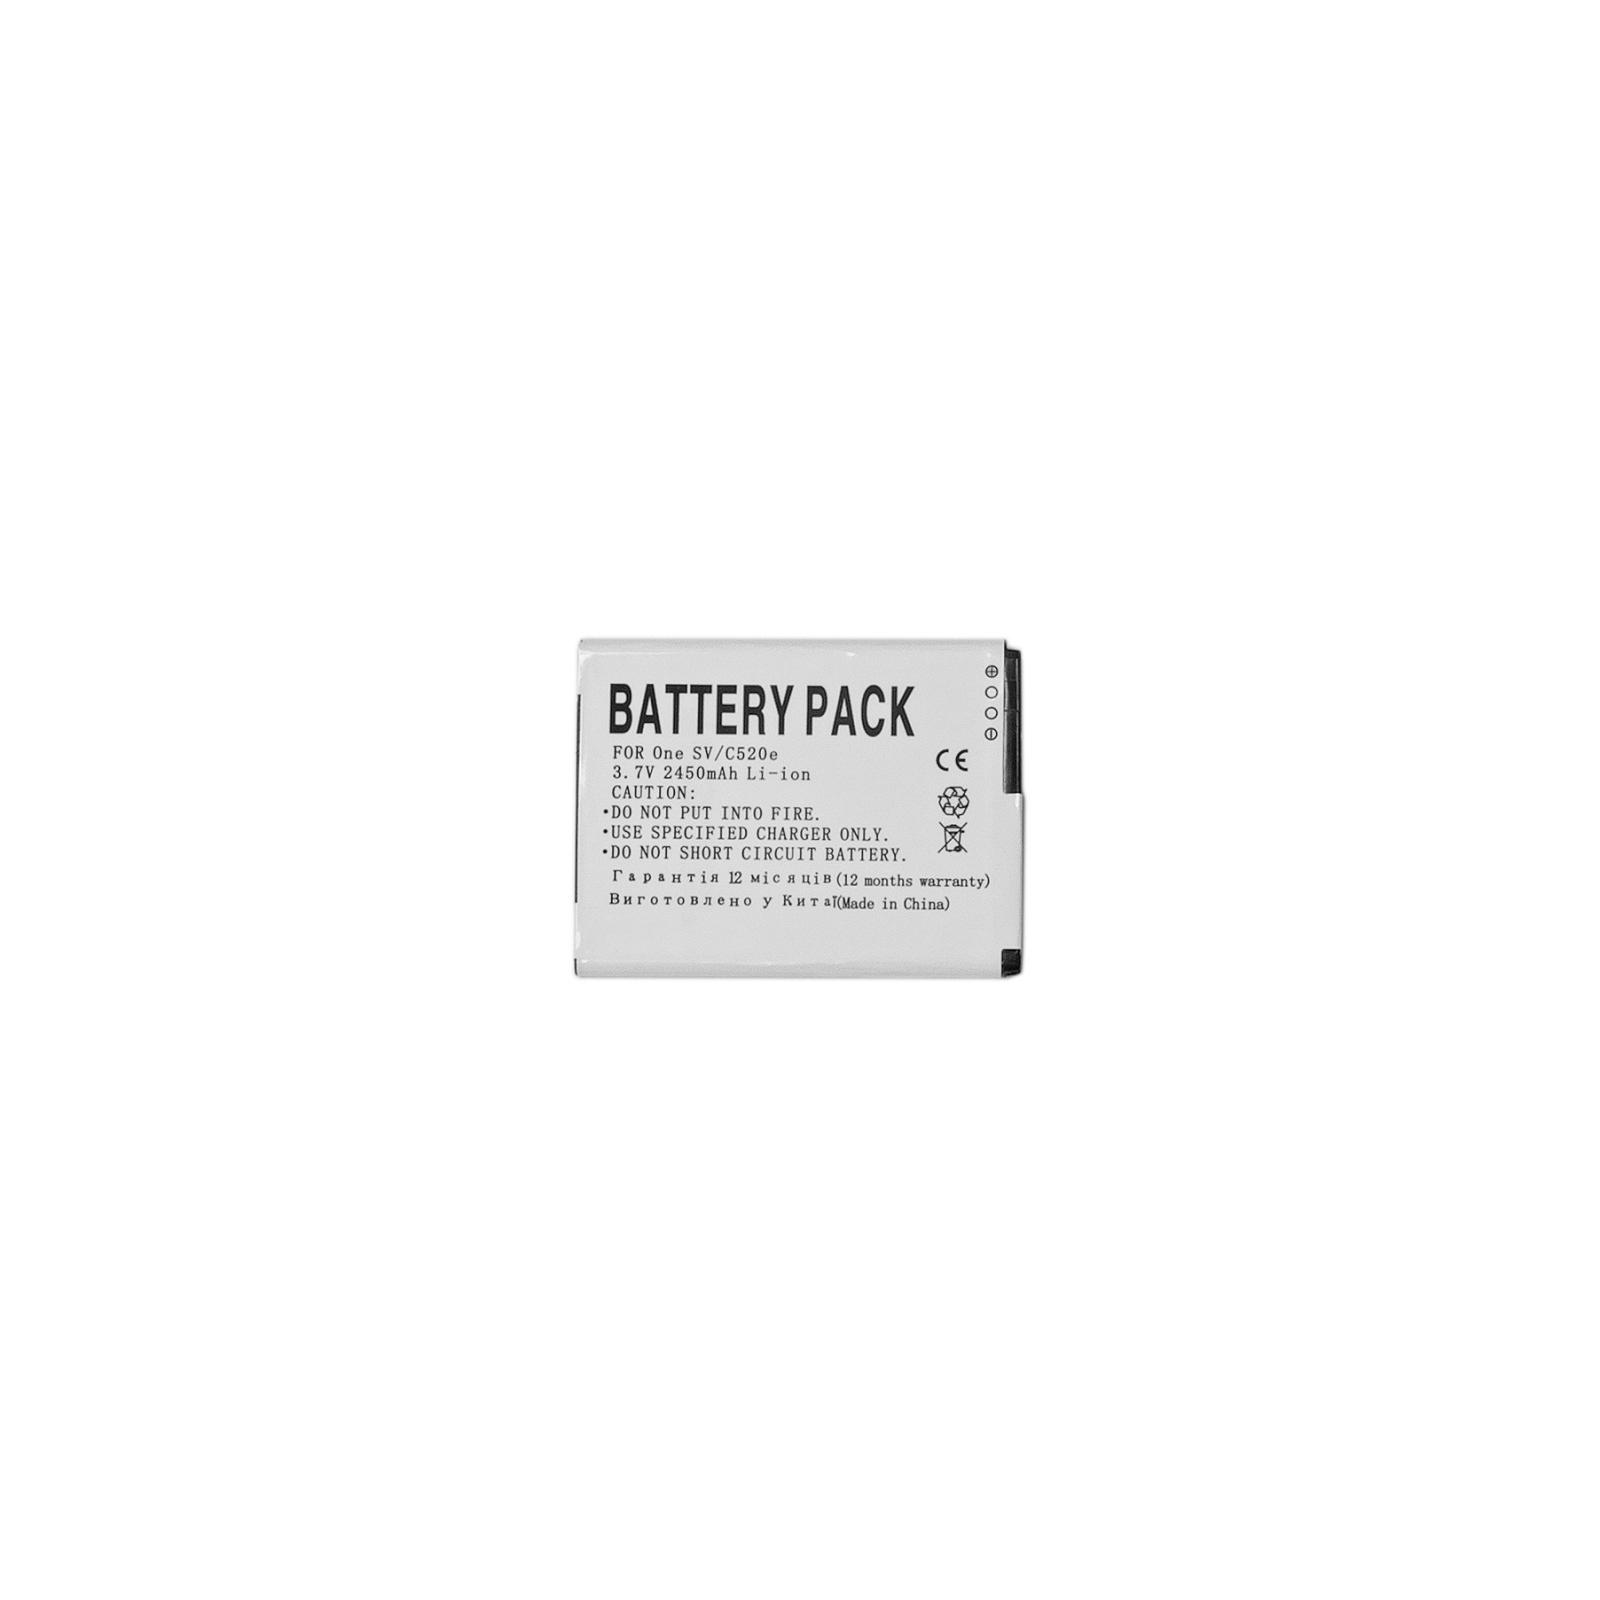 Аккумуляторная батарея PowerPlant HTCT528W, PM60120, One SV, C520e, C525E, C525C (DV00DV6202) изображение 2